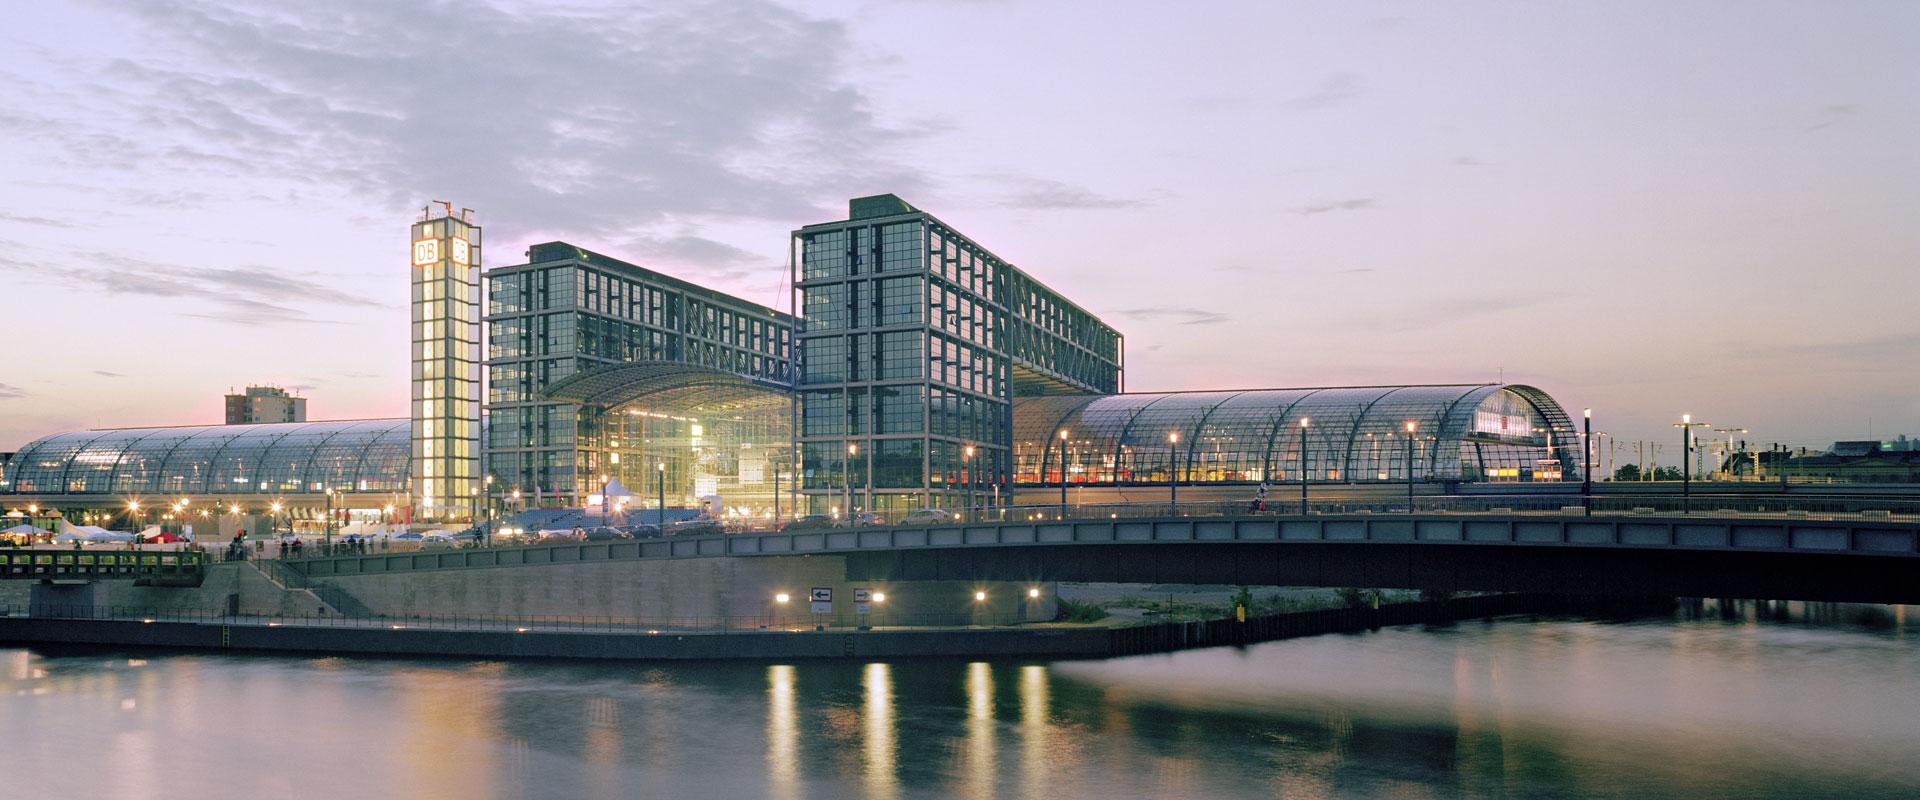 La gare centrale de Berlin Berlin Allemagne